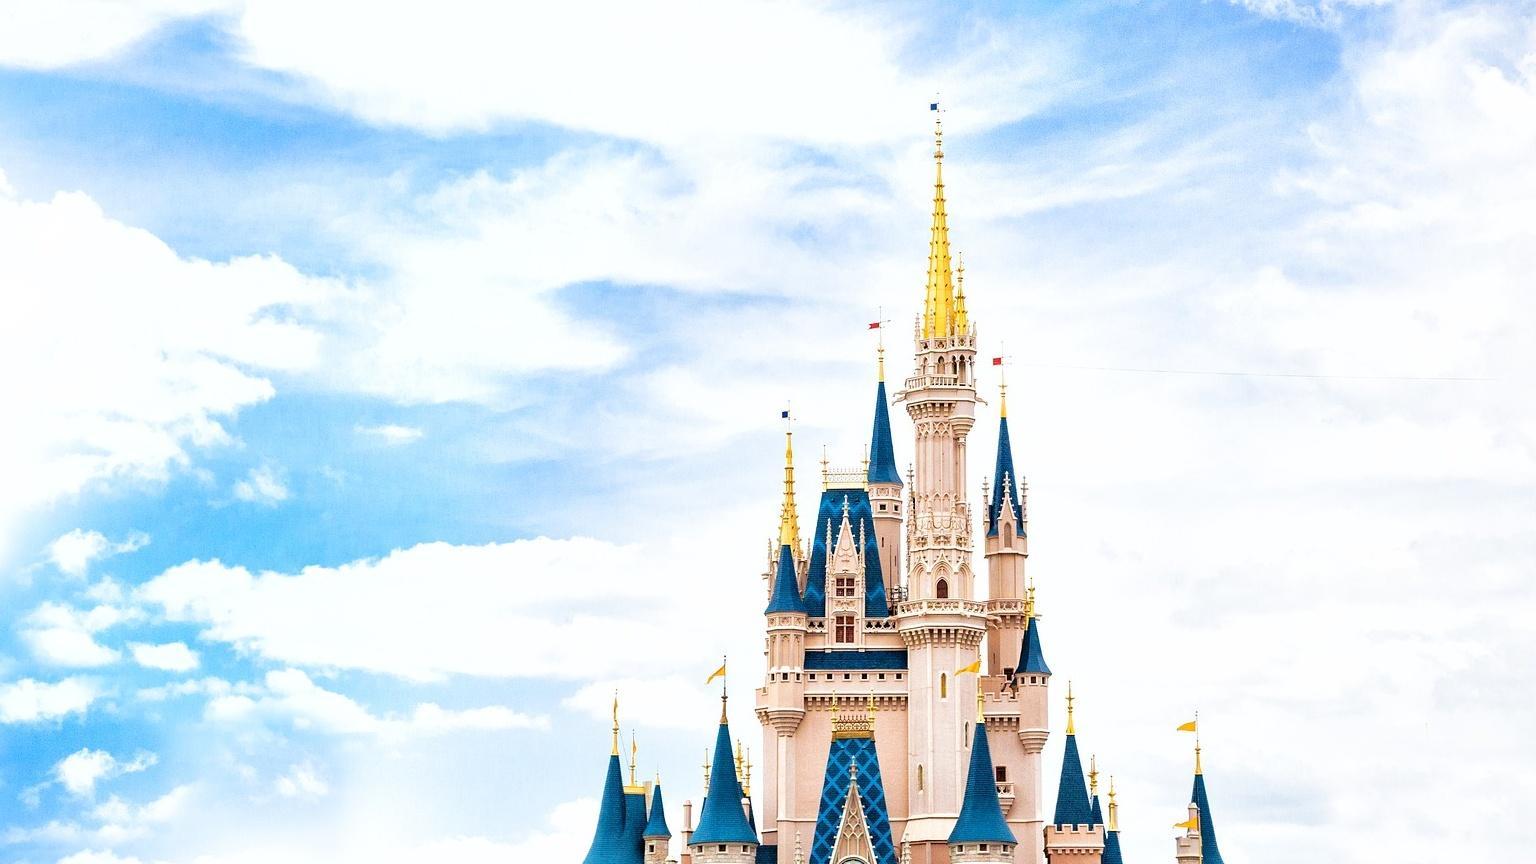 Disney Plus kündigen: So geht's!